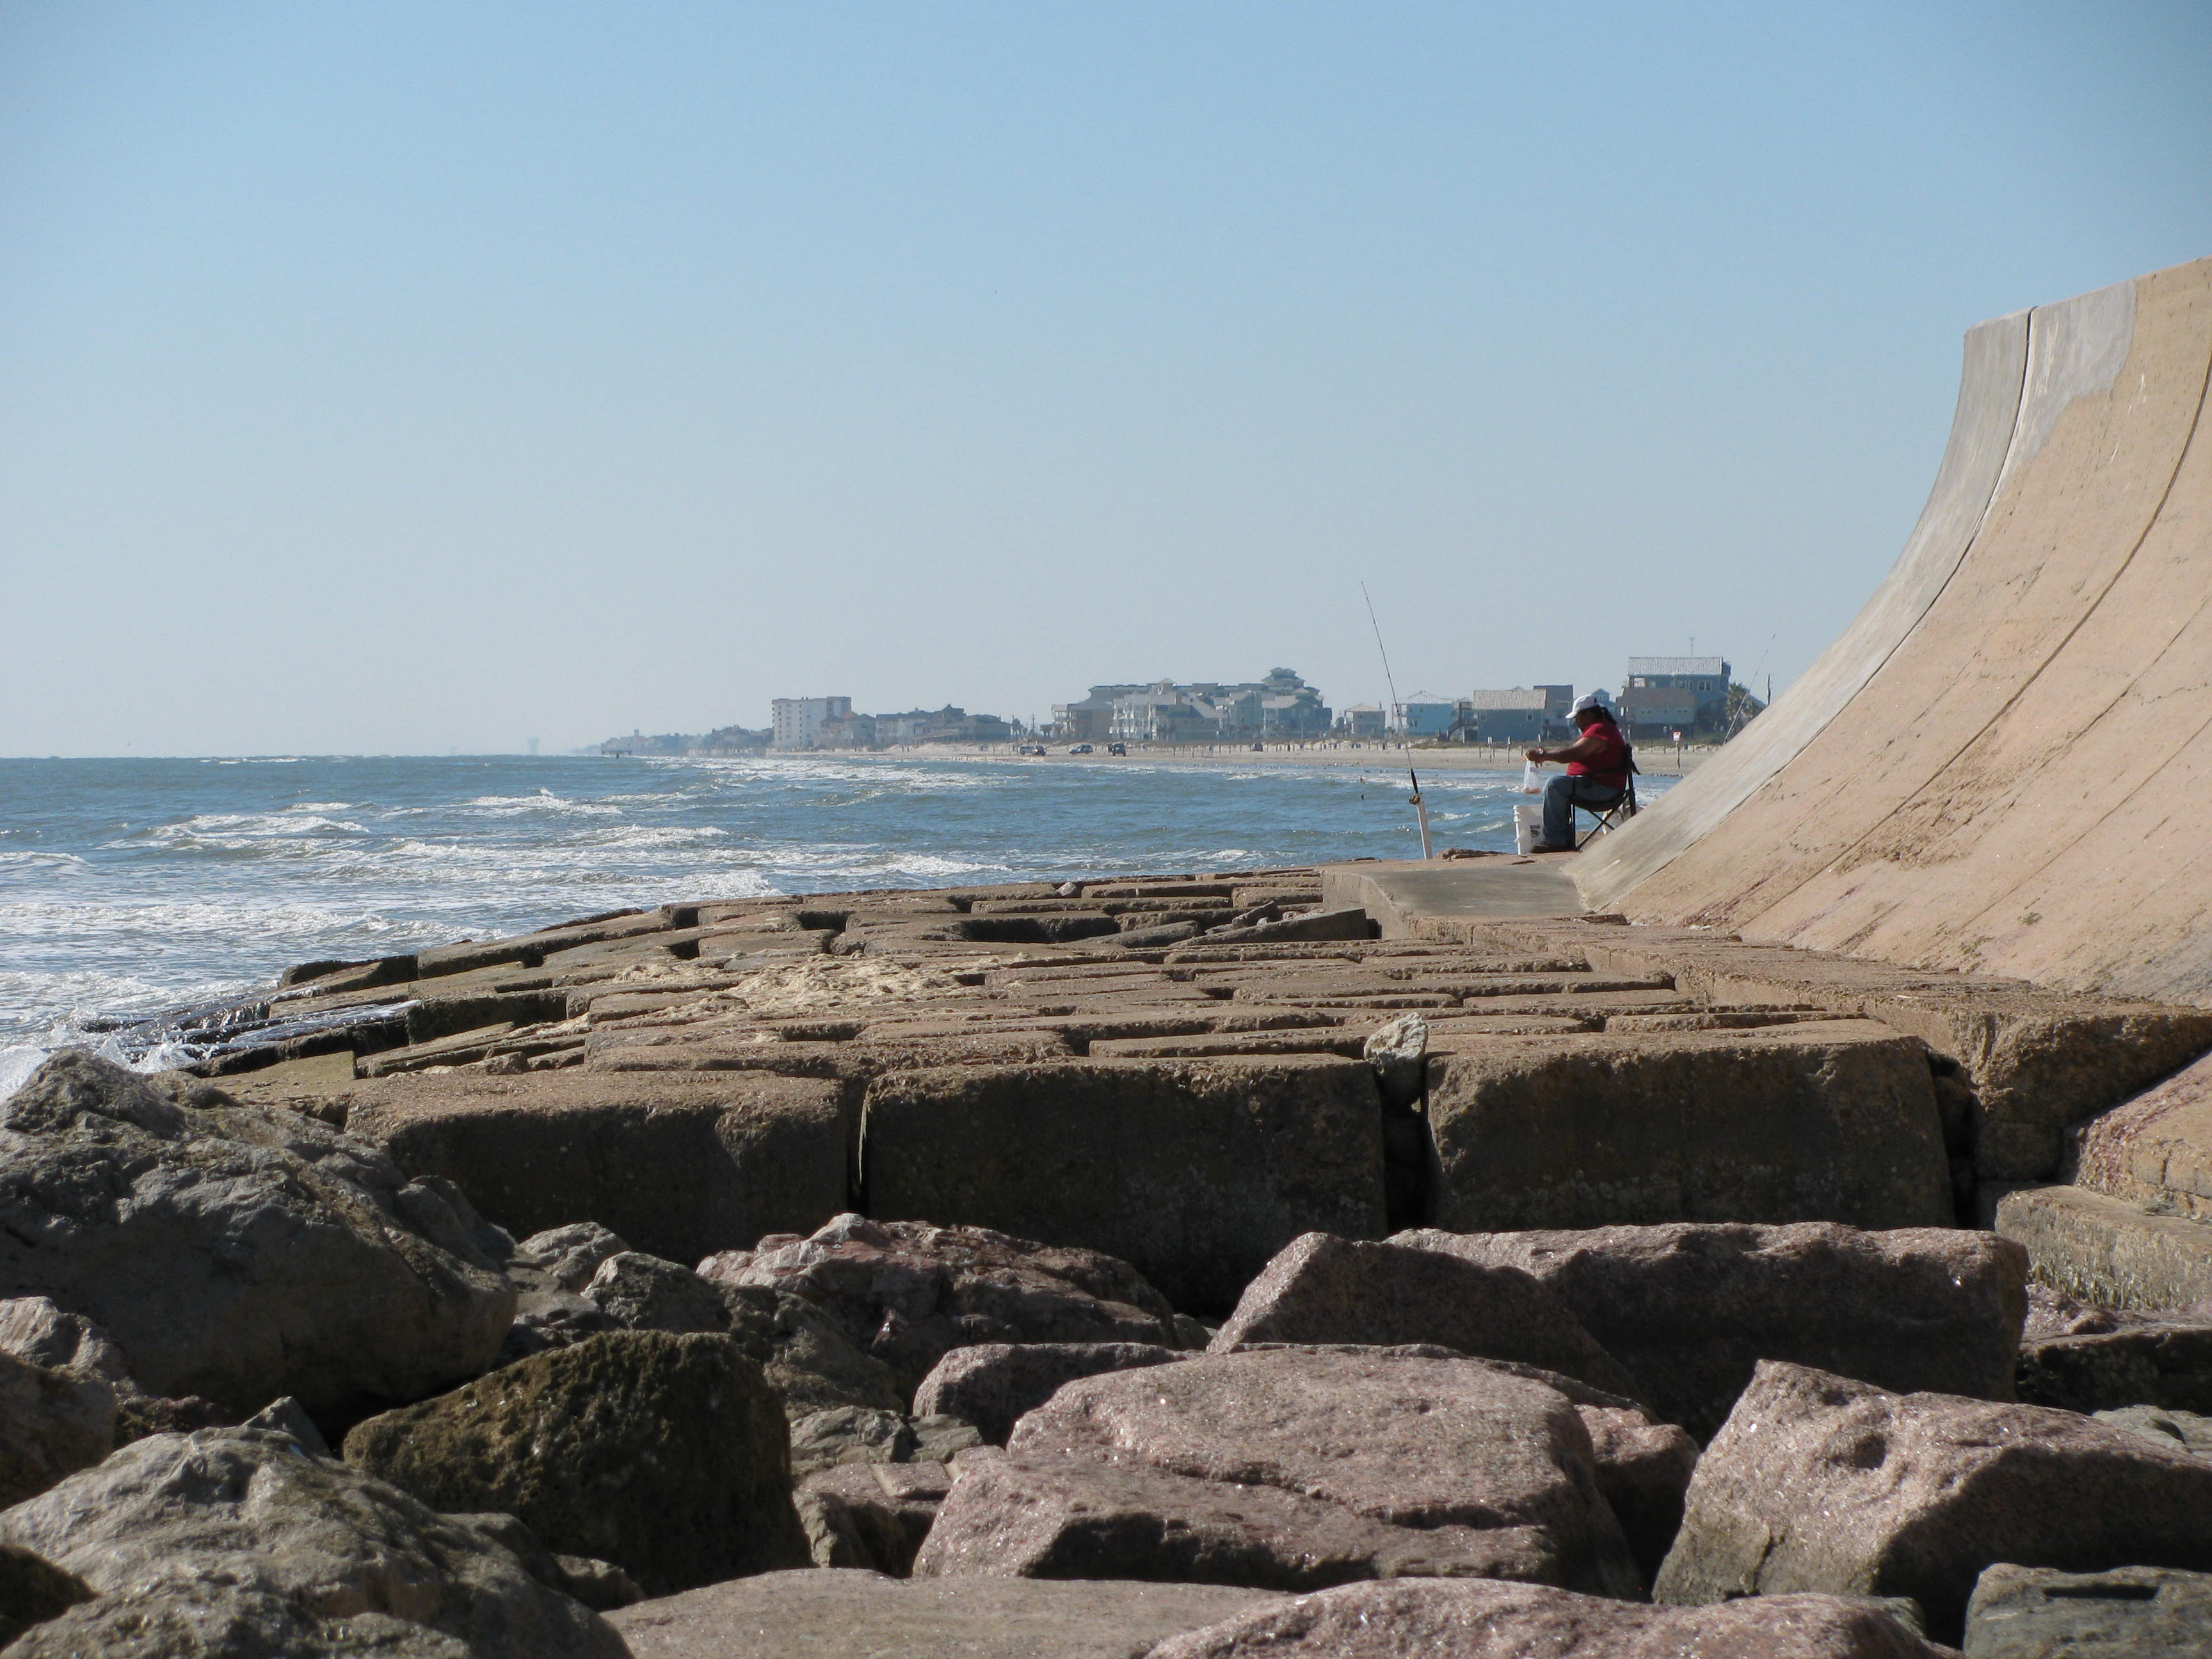 Renewable Resources: Gulf Coast Renewable Resources